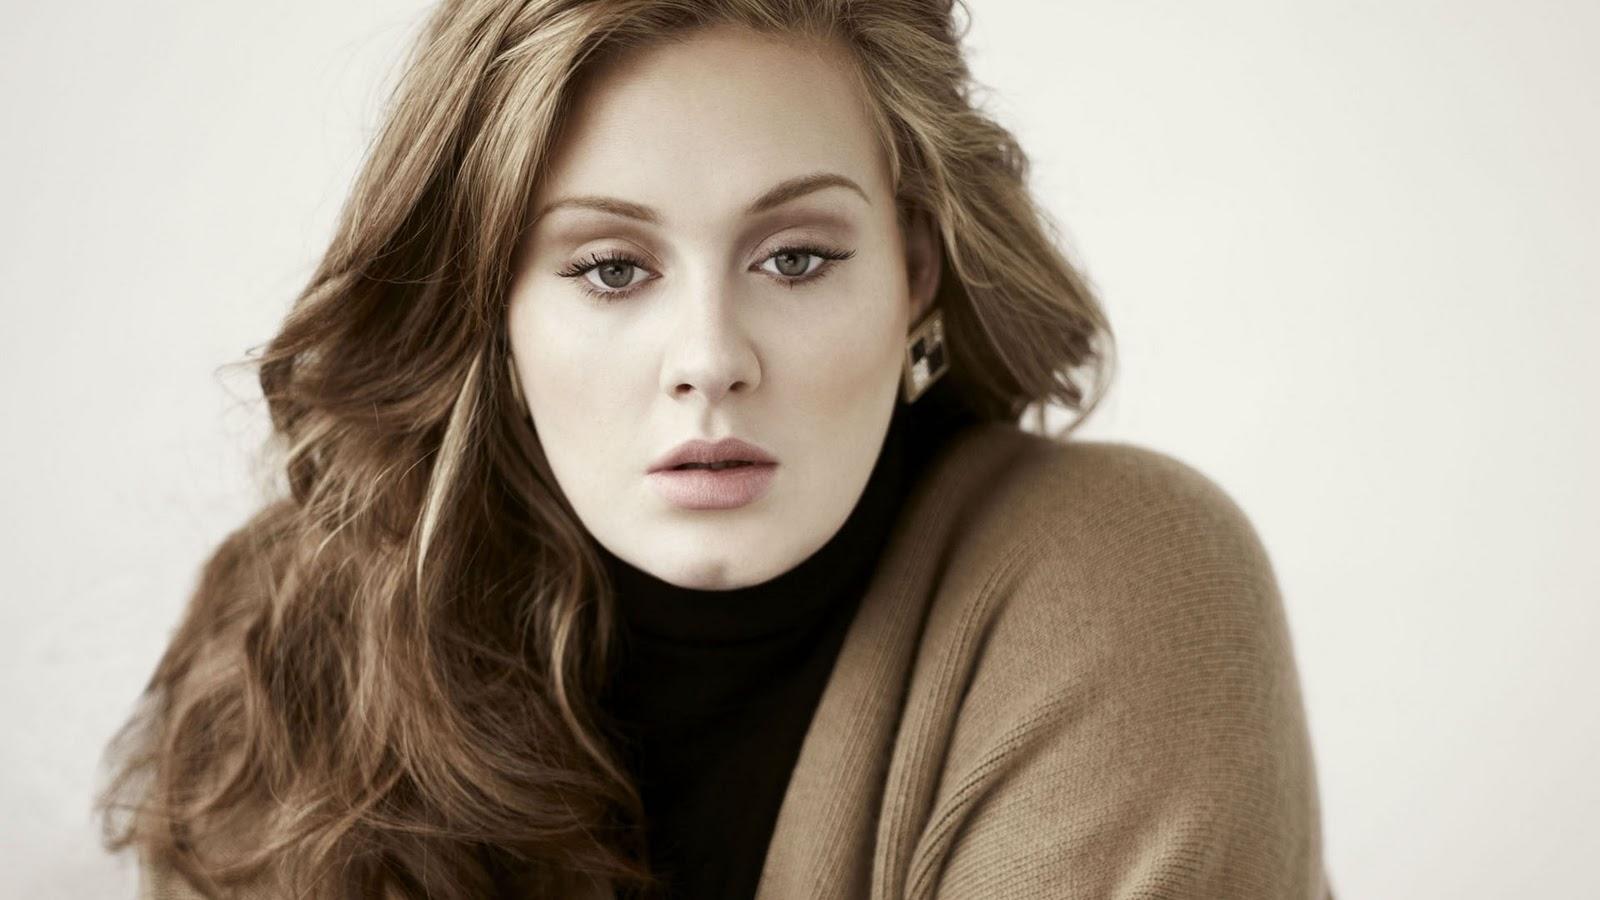 http://1.bp.blogspot.com/-oL9V49Sv3S4/TvtOZsNAqkI/AAAAAAAADgg/qW8muRgAt-s/s1600/Adele.jpg